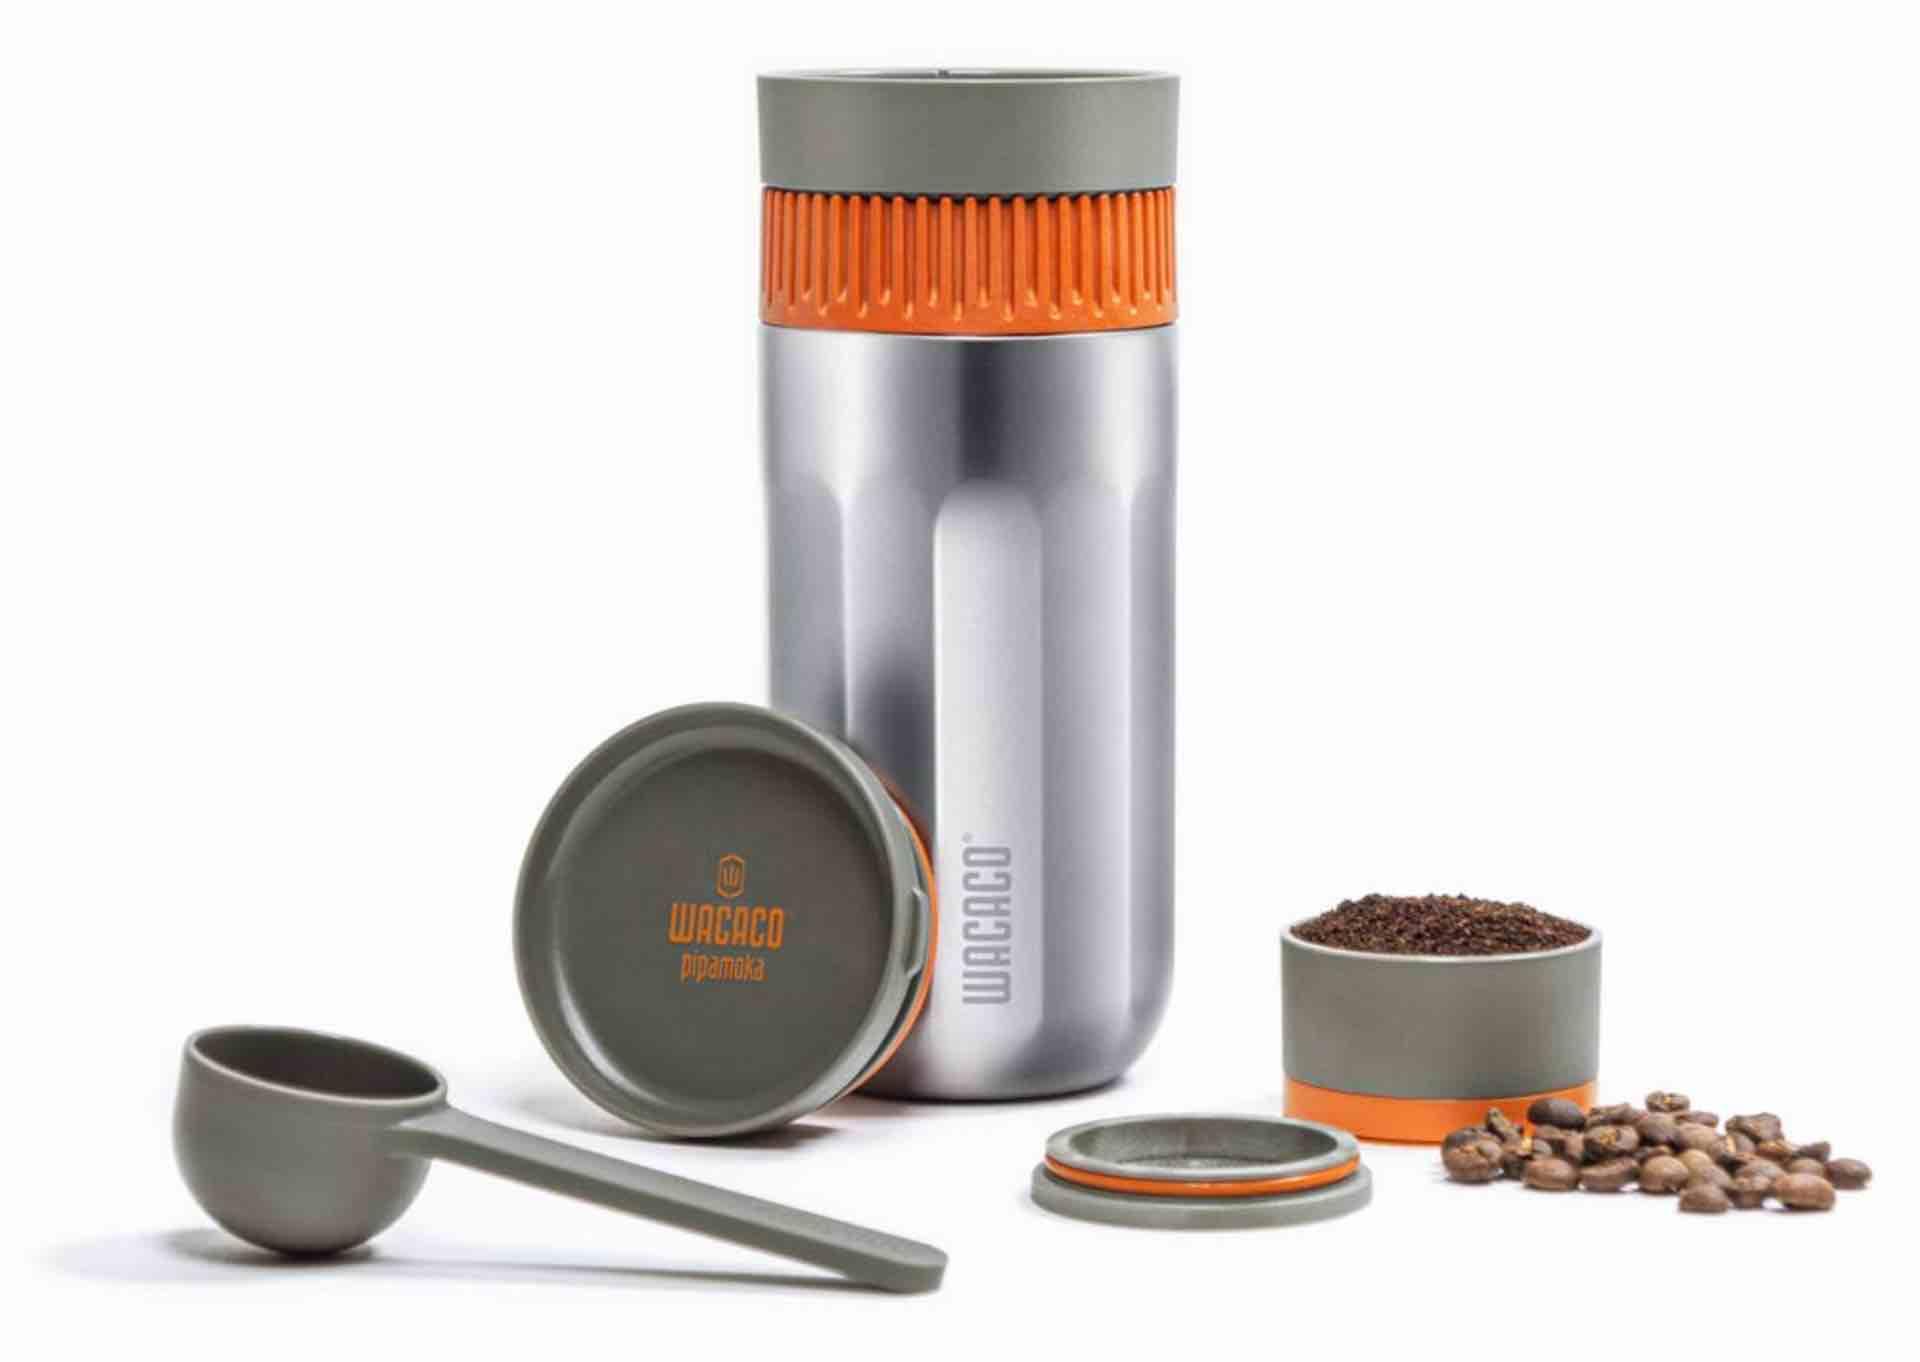 wacaco-pipamoka-vacuum-pressured-portable-coffee-maker